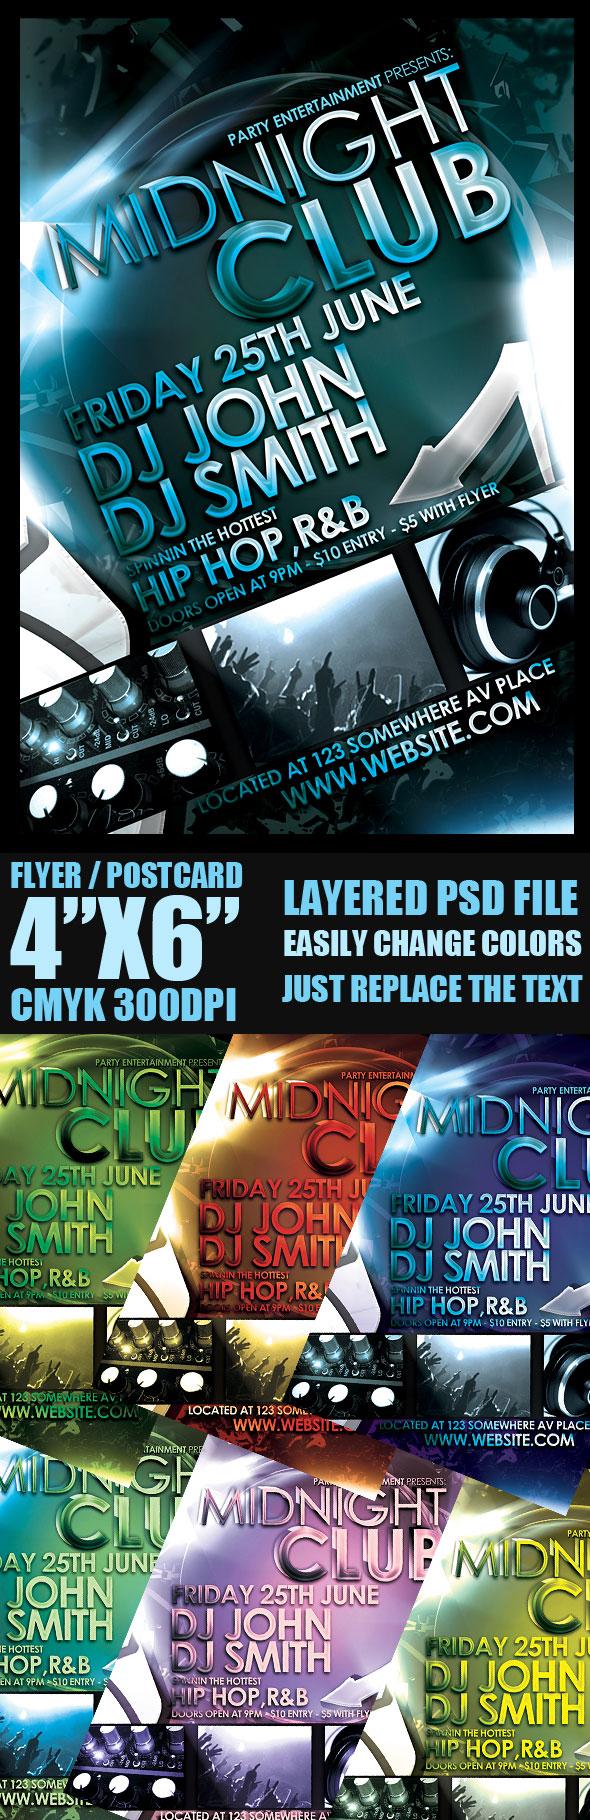 p205 - لایه باز رایگان پوستر کلوپ شبانه پارتی موسیقی دی جی